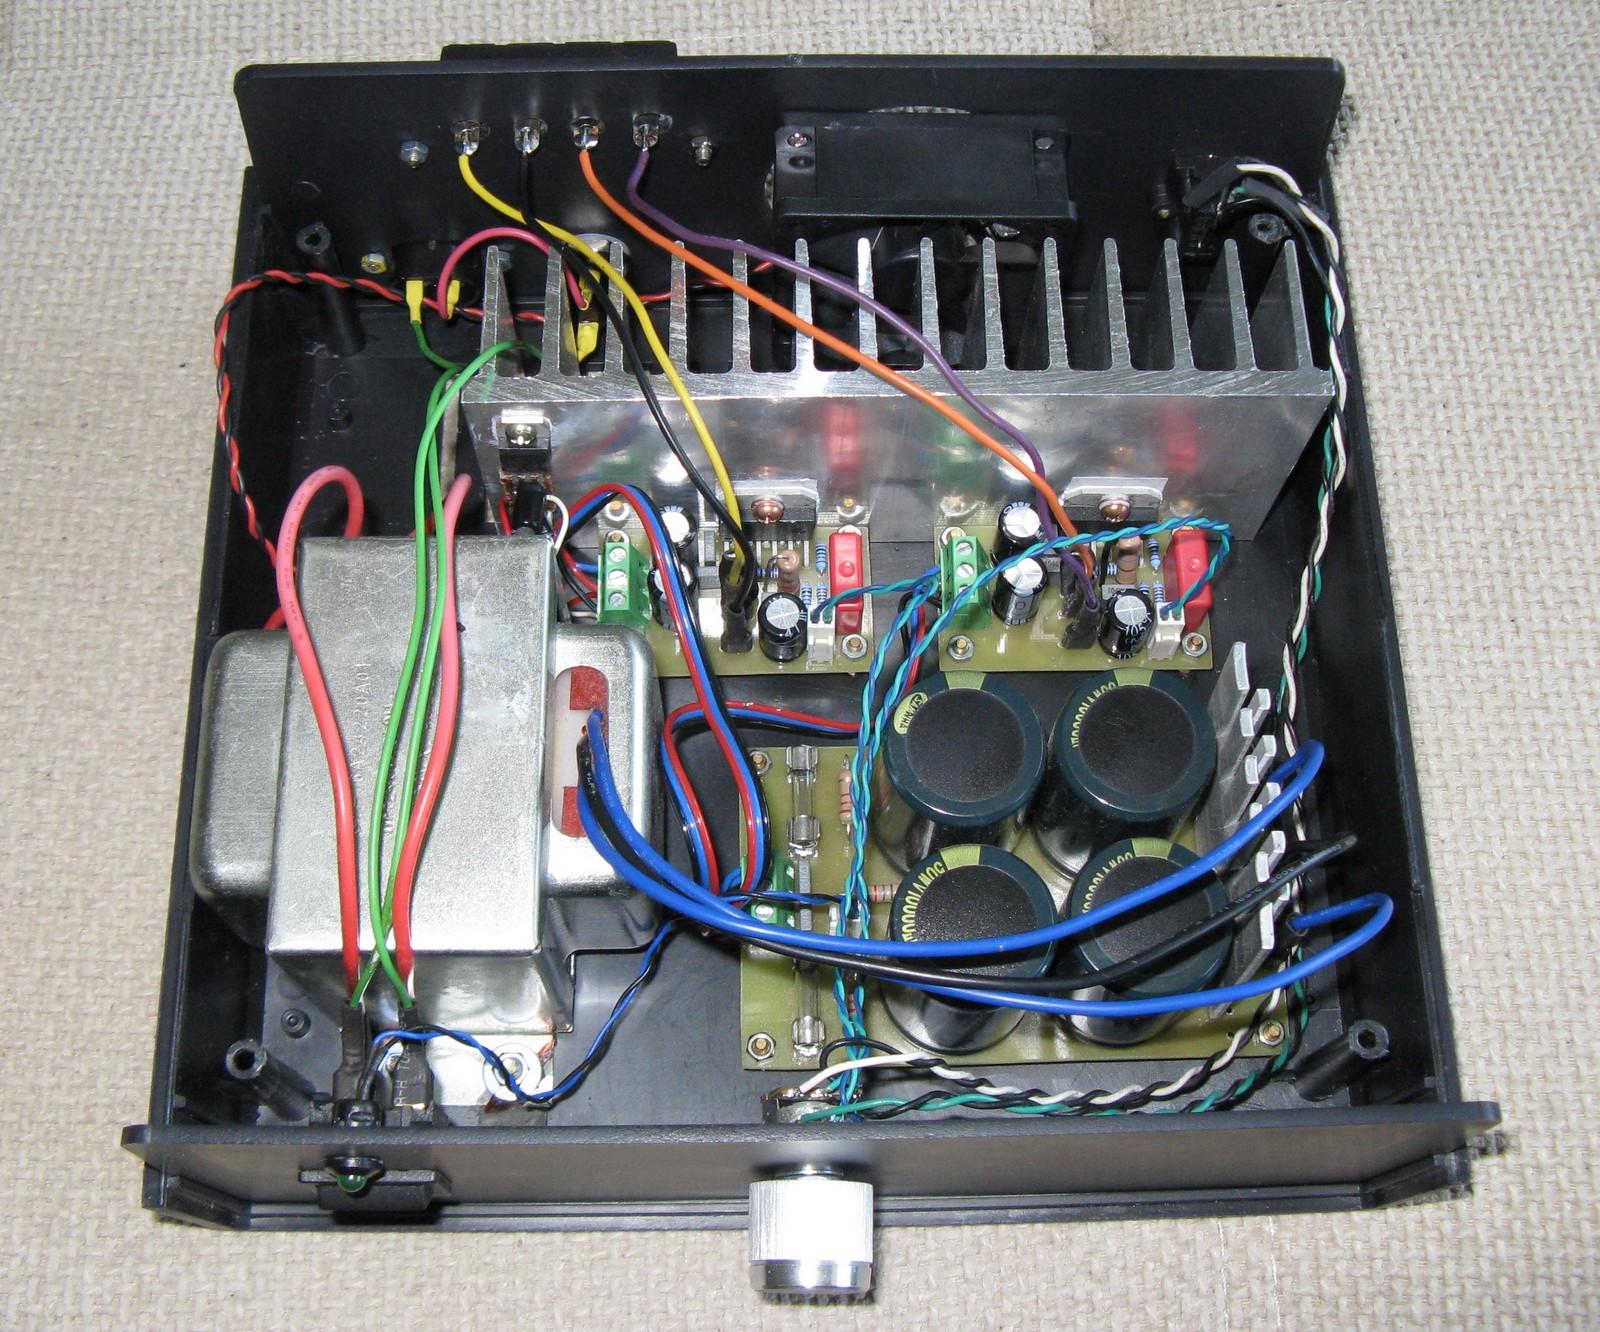 Electronics Diycom Low Power Fm Transmitter Diagram 50w Lm3886 Amplifier